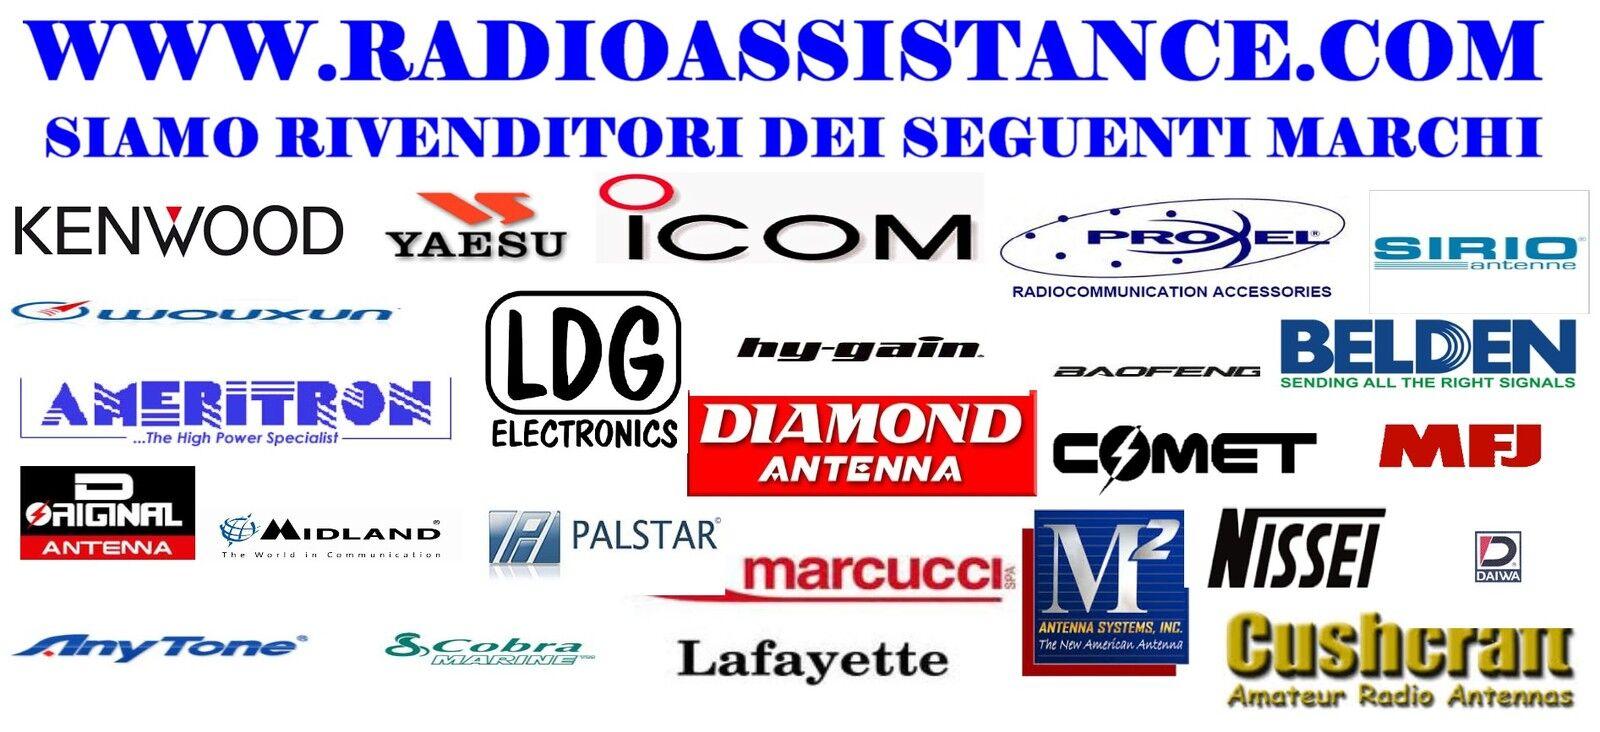 RADIOASSISTANCE